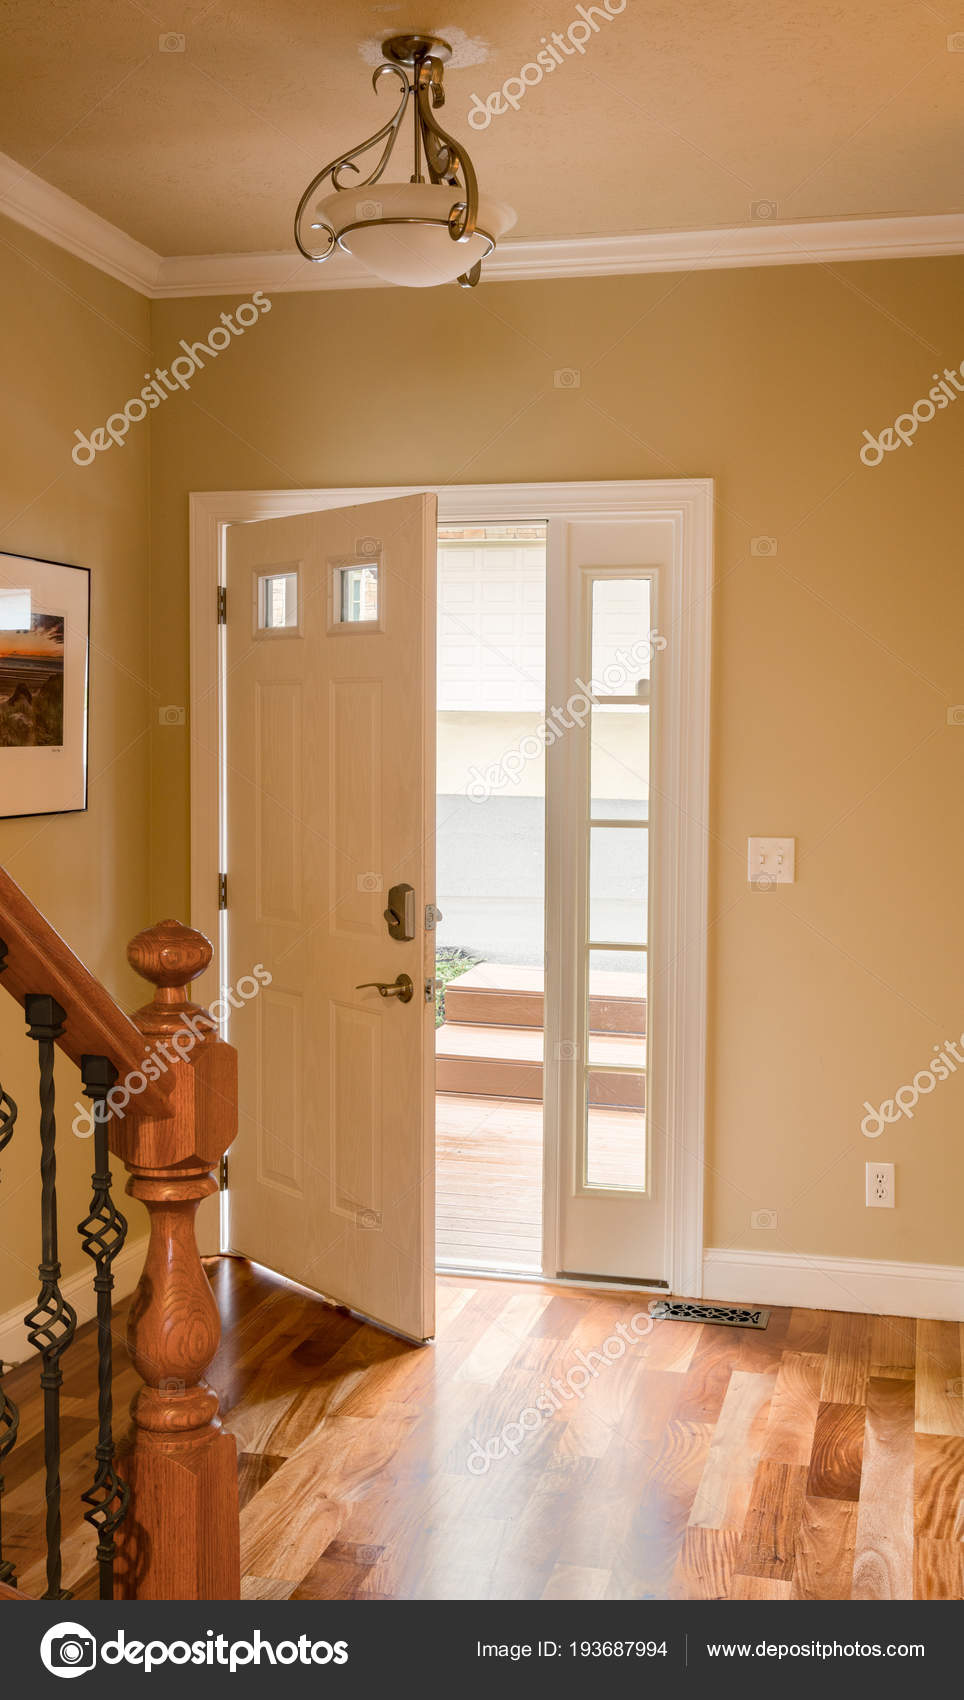 Entrada piso madera puerta de entrada y pasillo con piso de madera foto de stock steveheap - Aislar puerta entrada piso ...